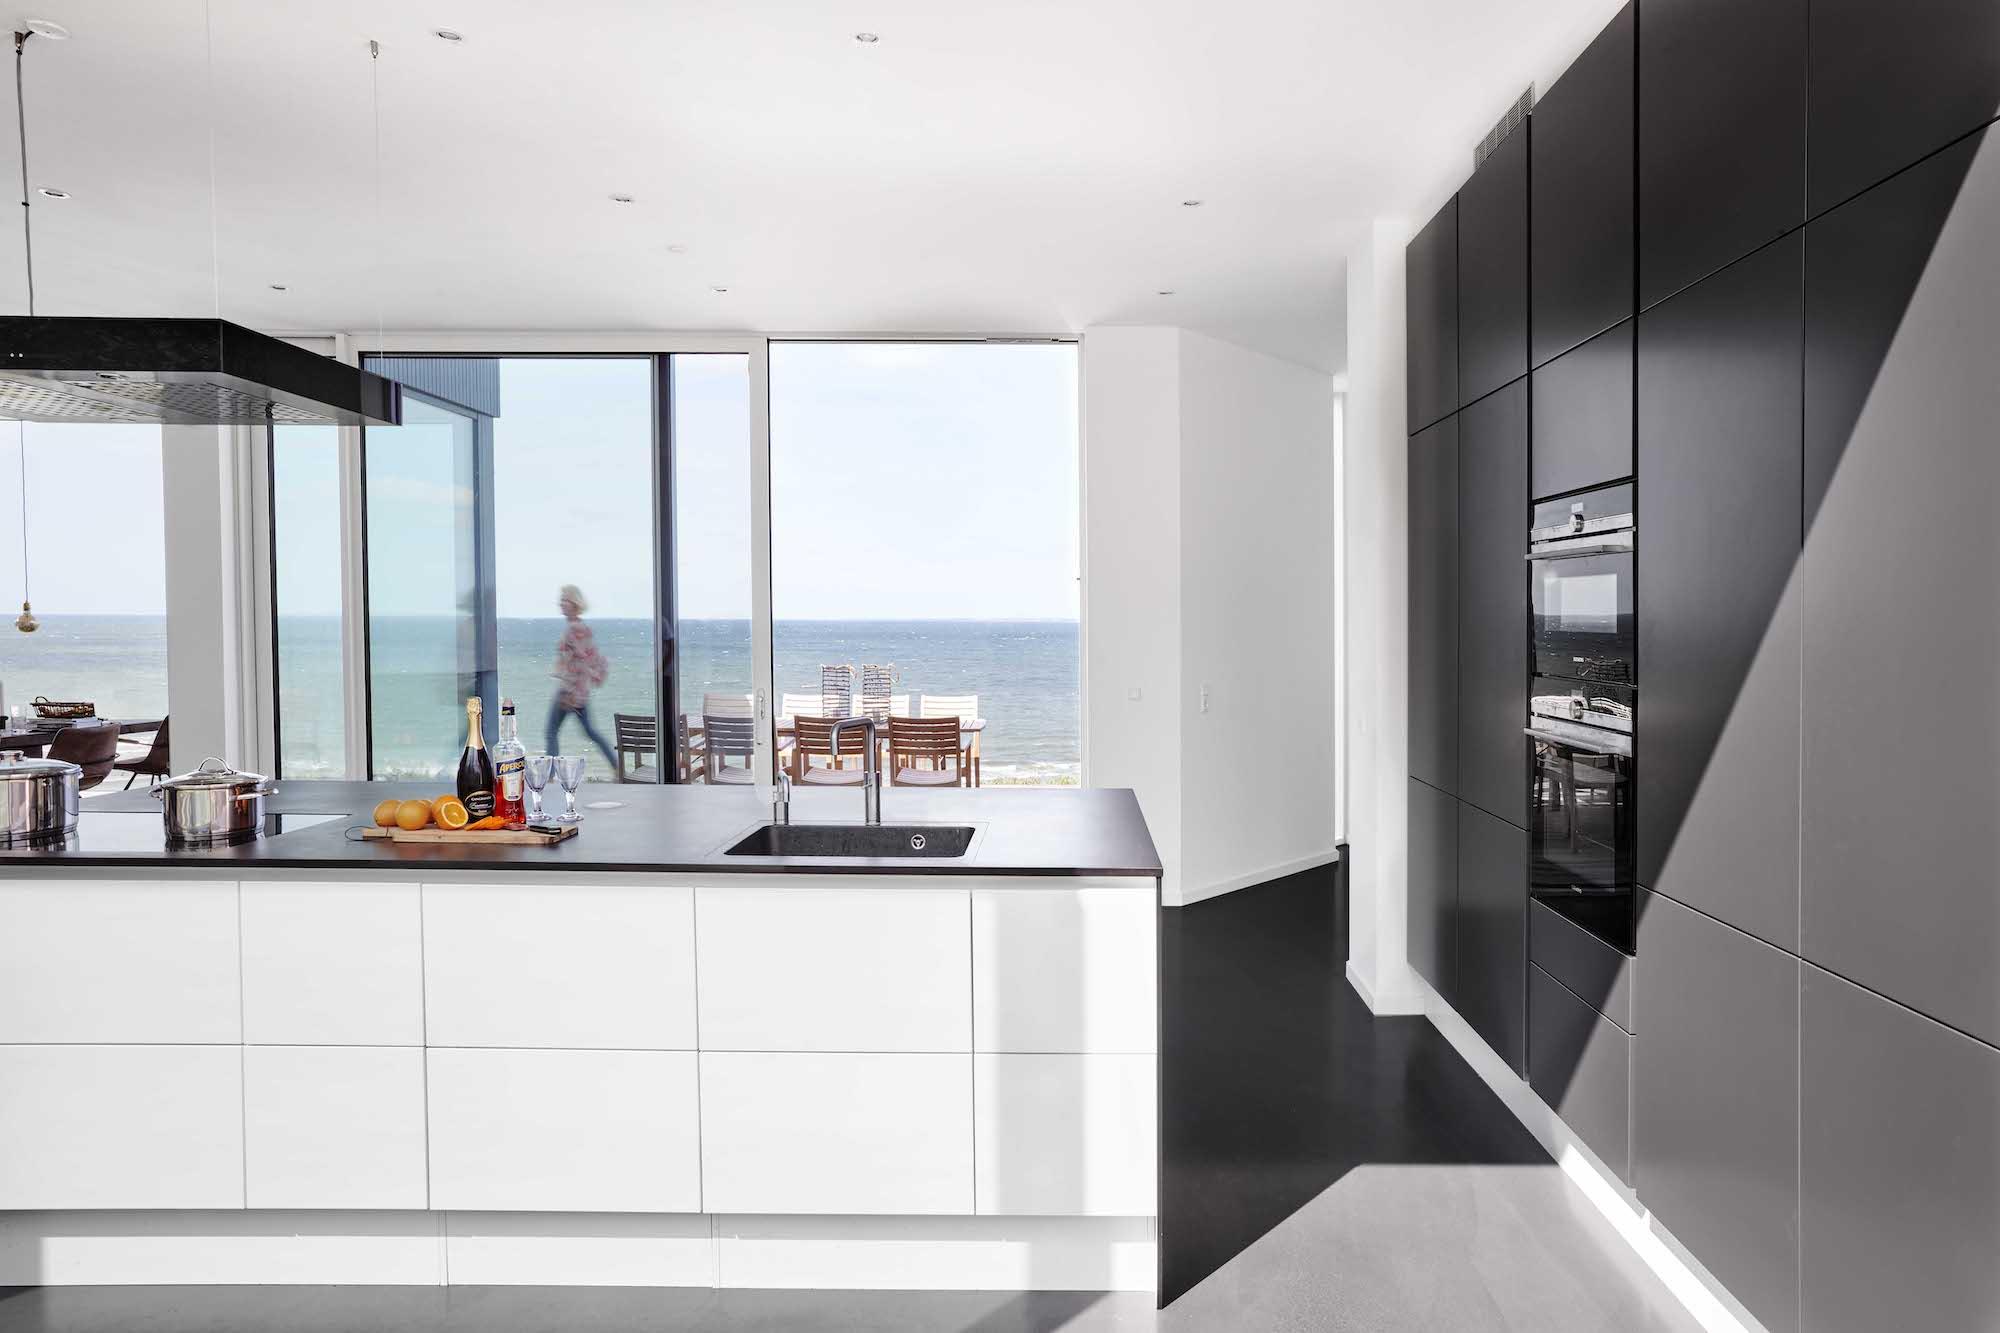 sun light enters the kitchen through large windows